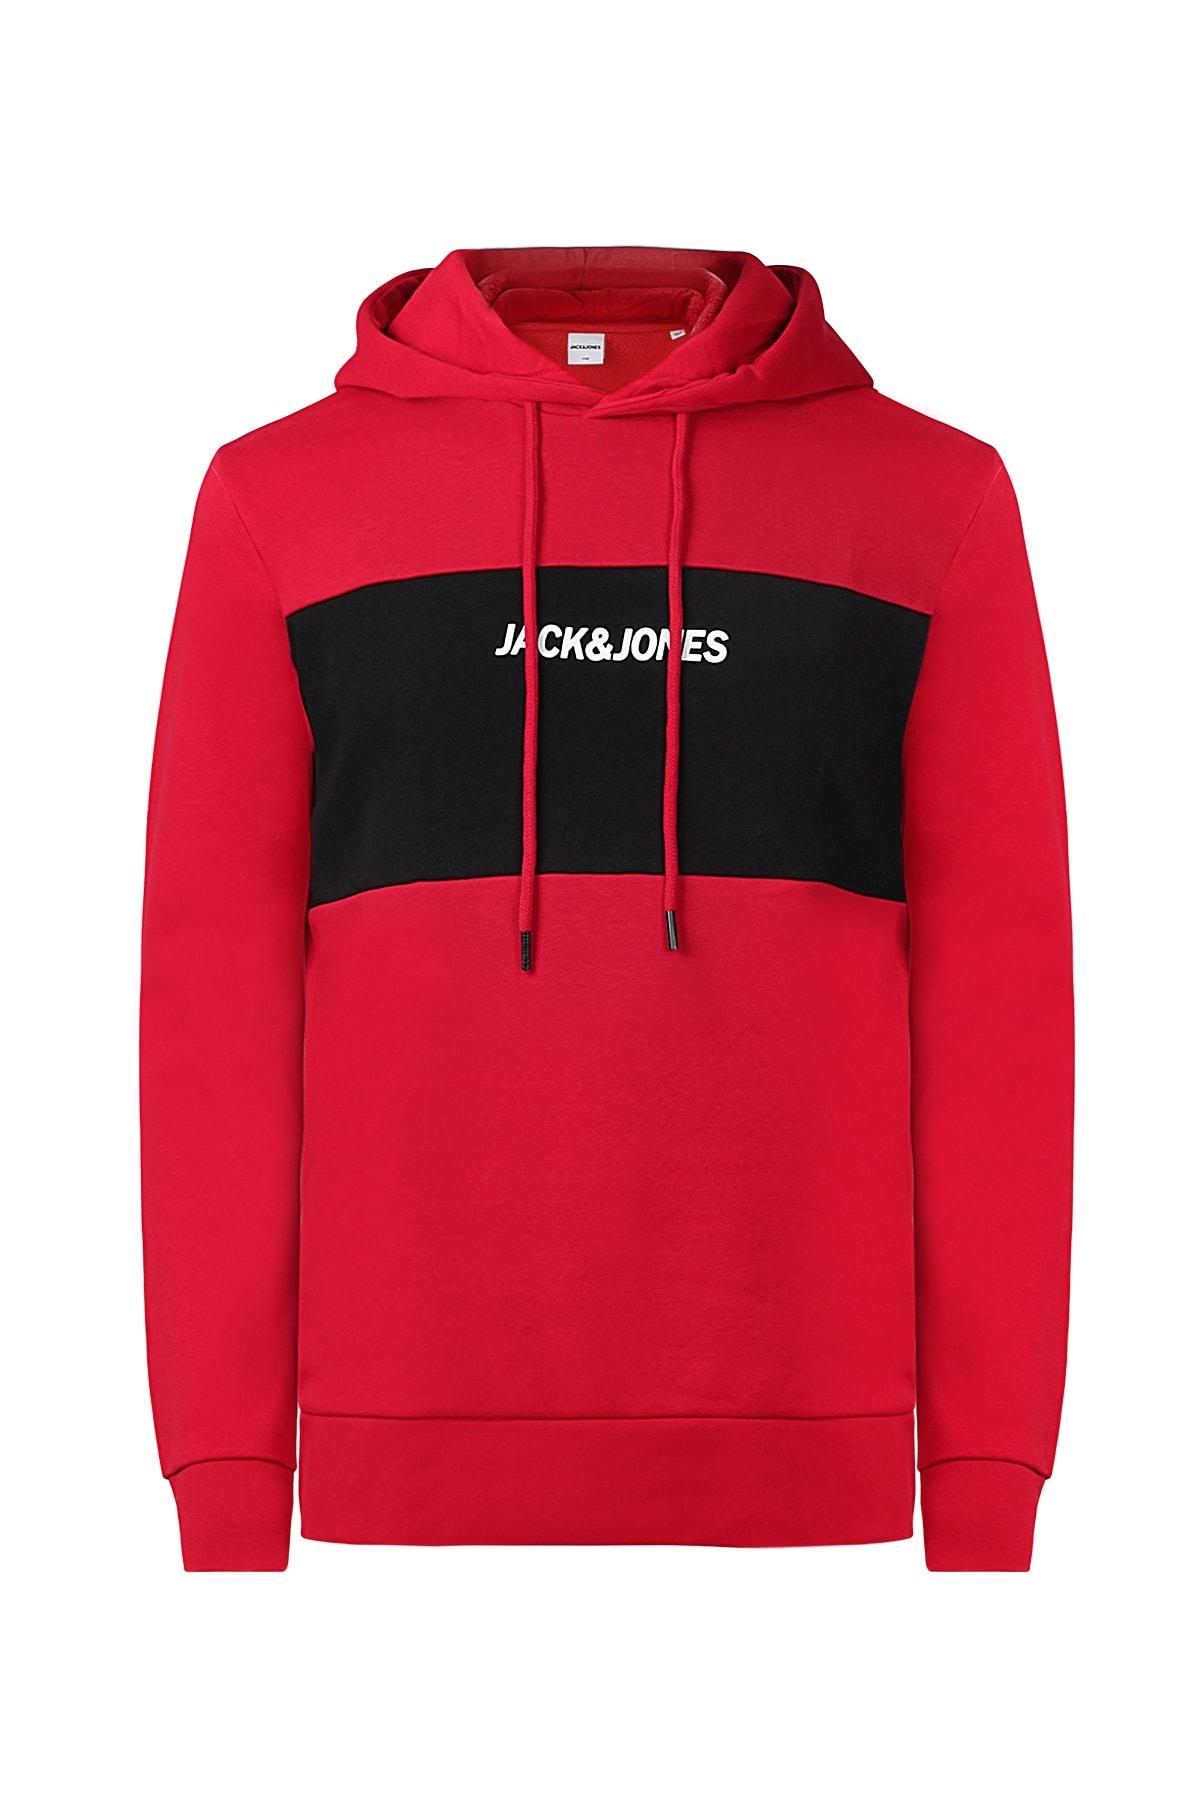 Jack & Jones Sweatshirt 12193085 JCODEONE 1